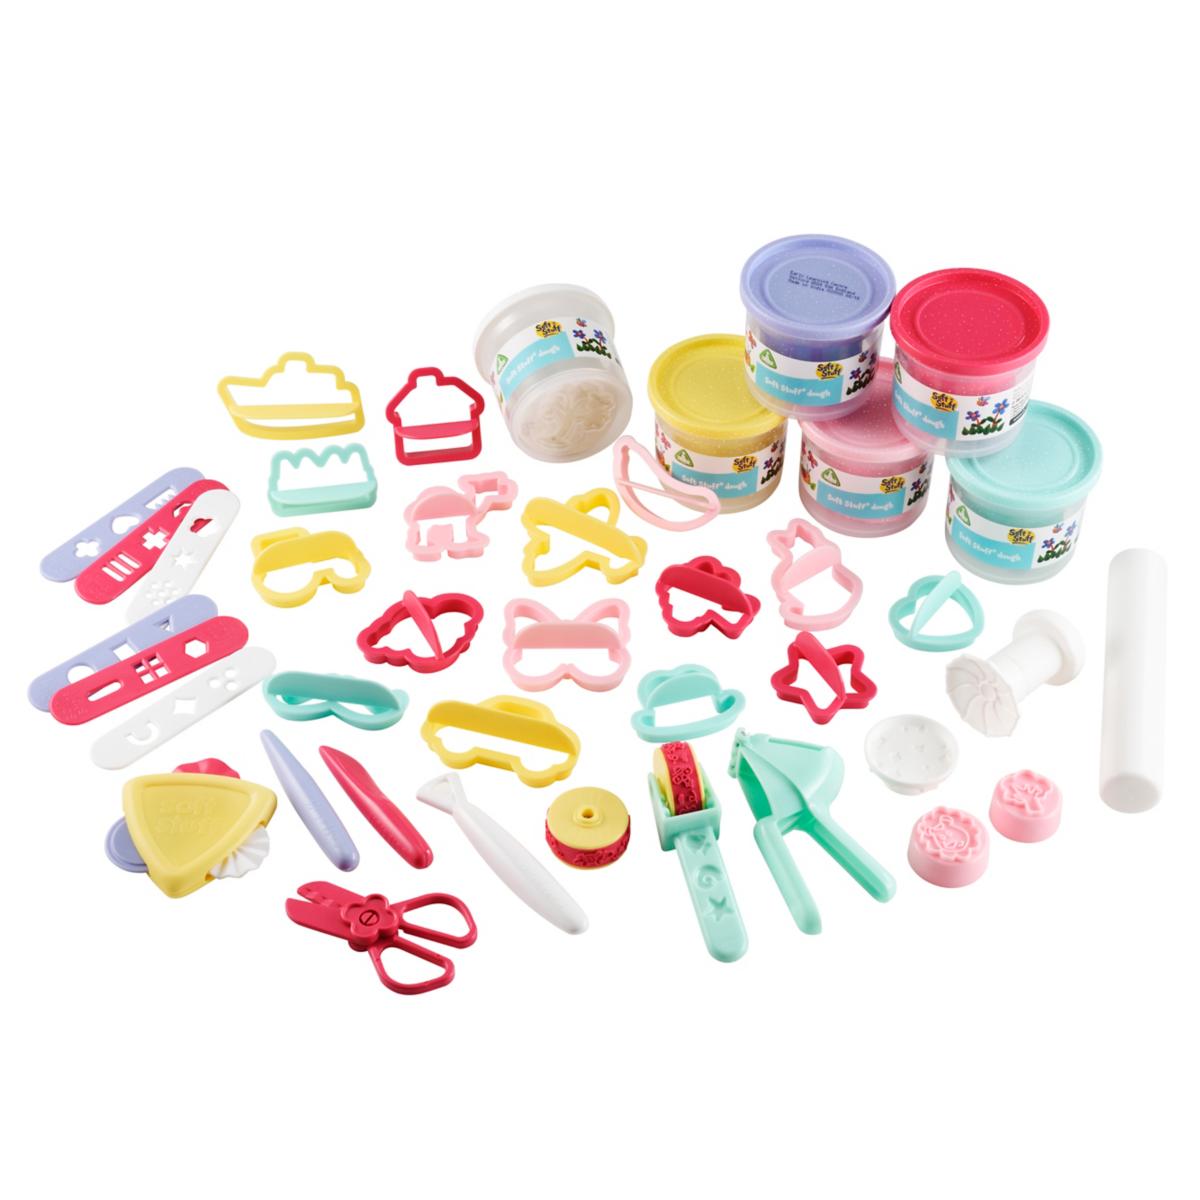 Soft Stuff Bumper Dough and Tool Set - Pastel